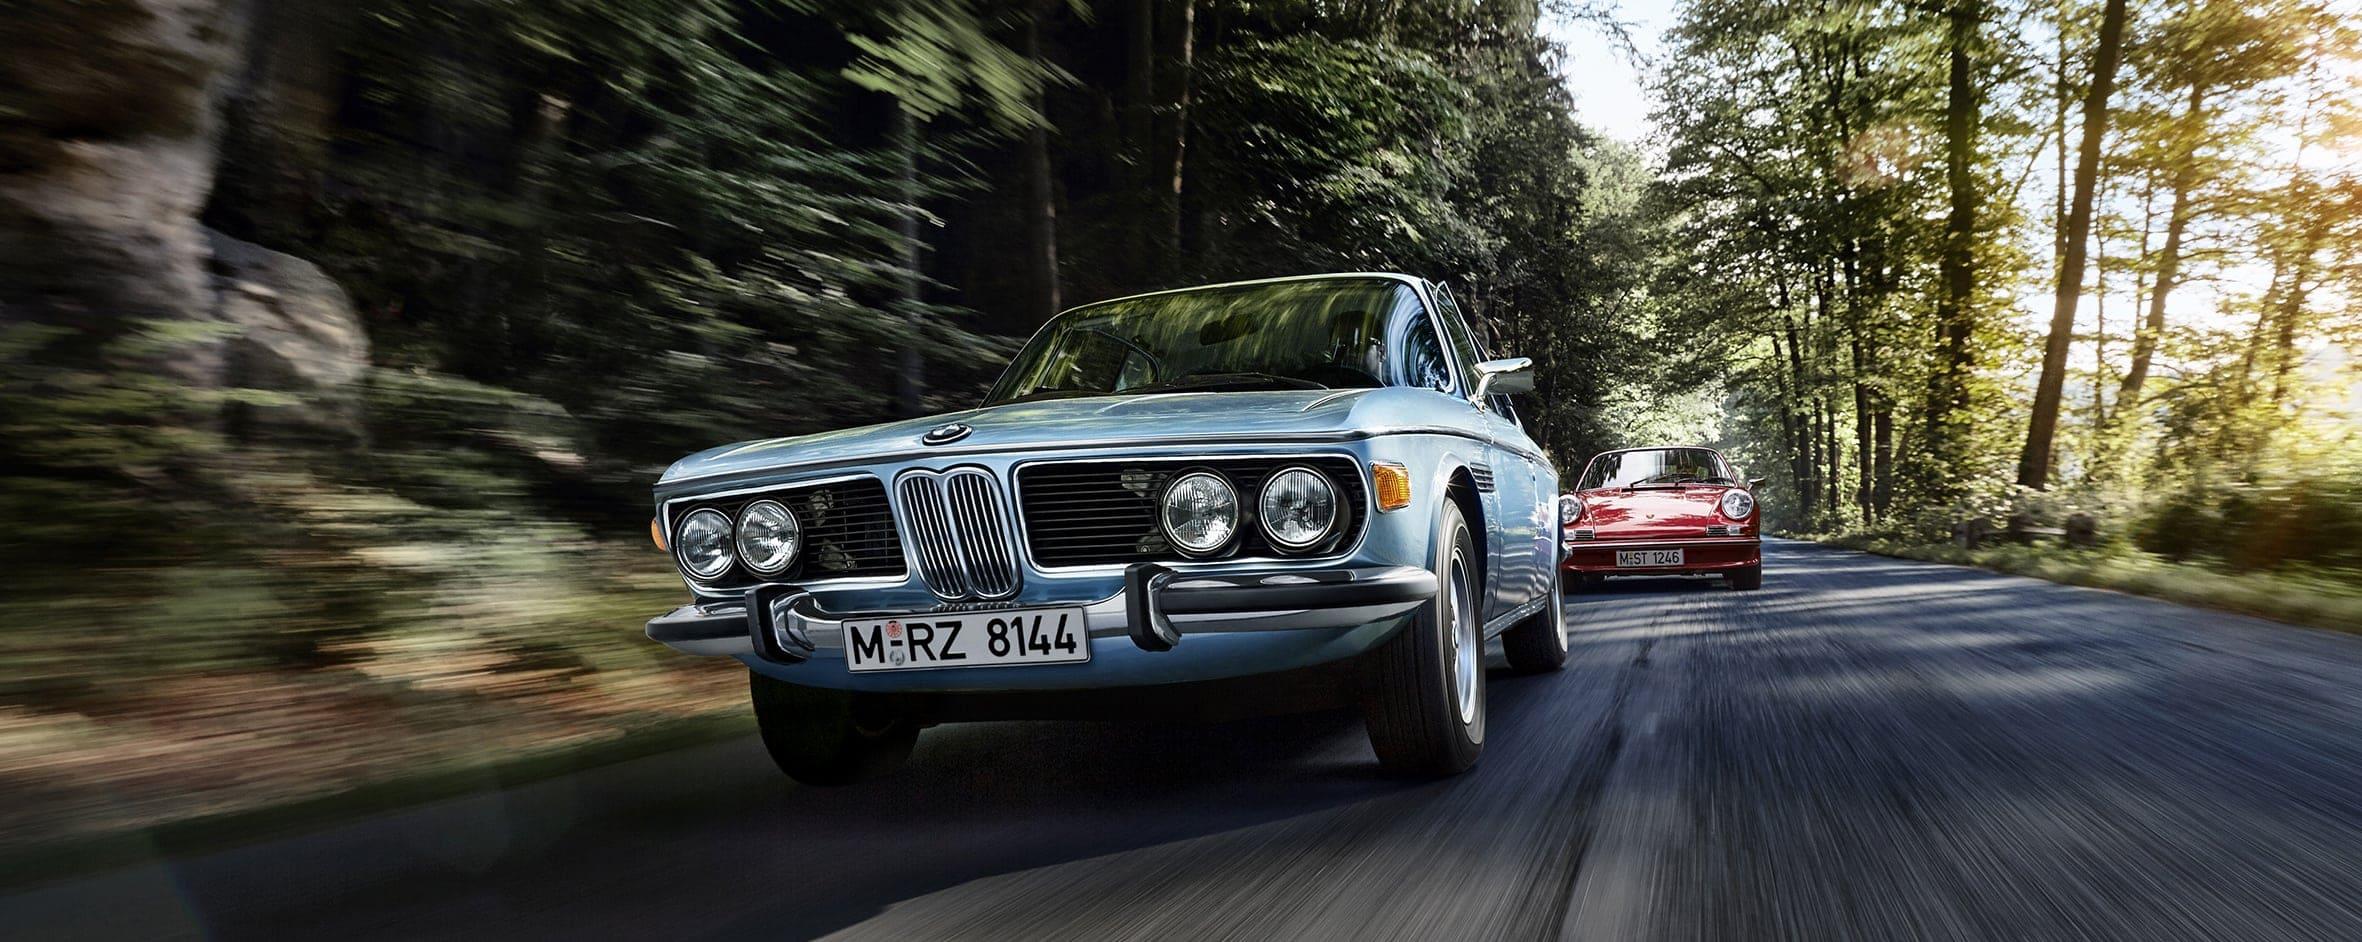 BMW_front_shot2